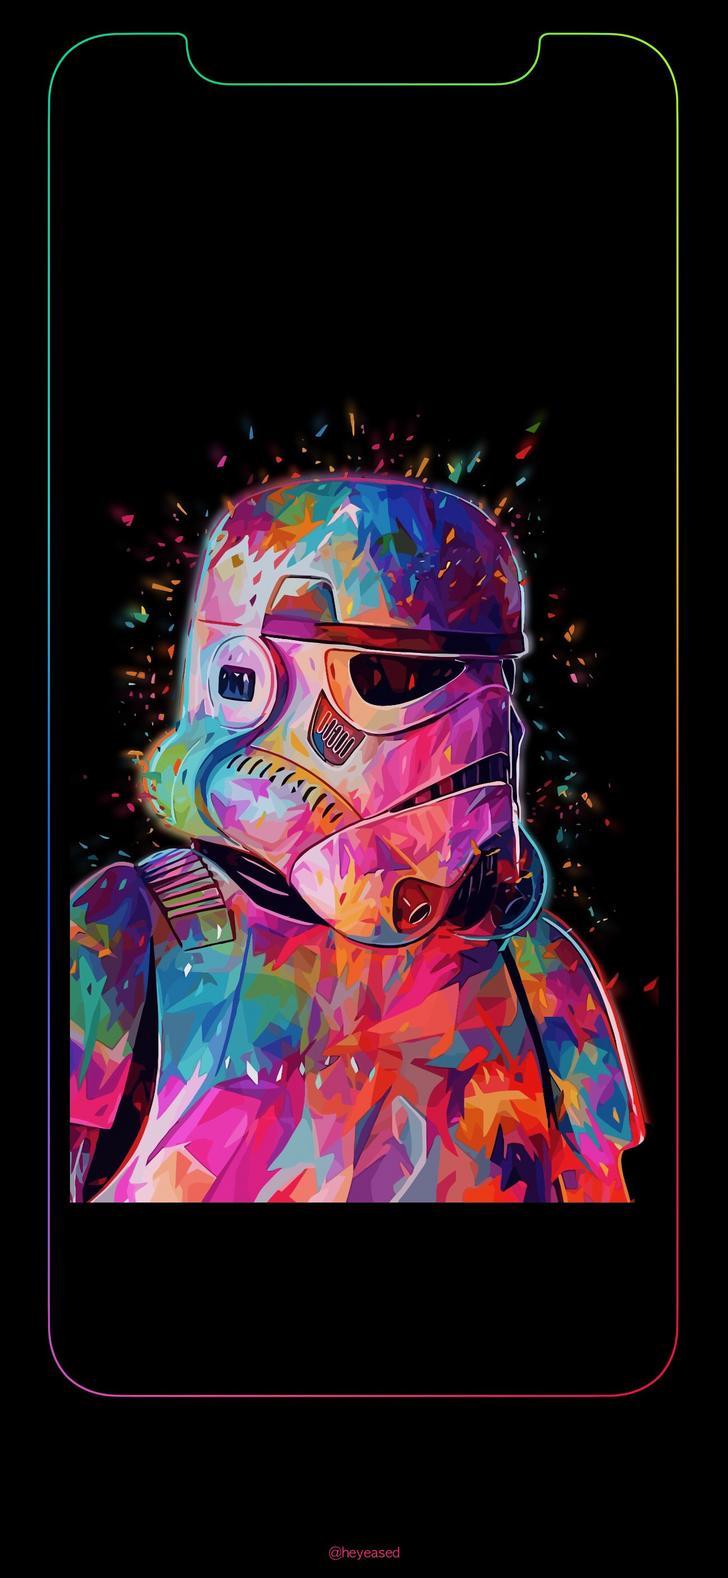 357 3572994 iphone wallpaper star wars